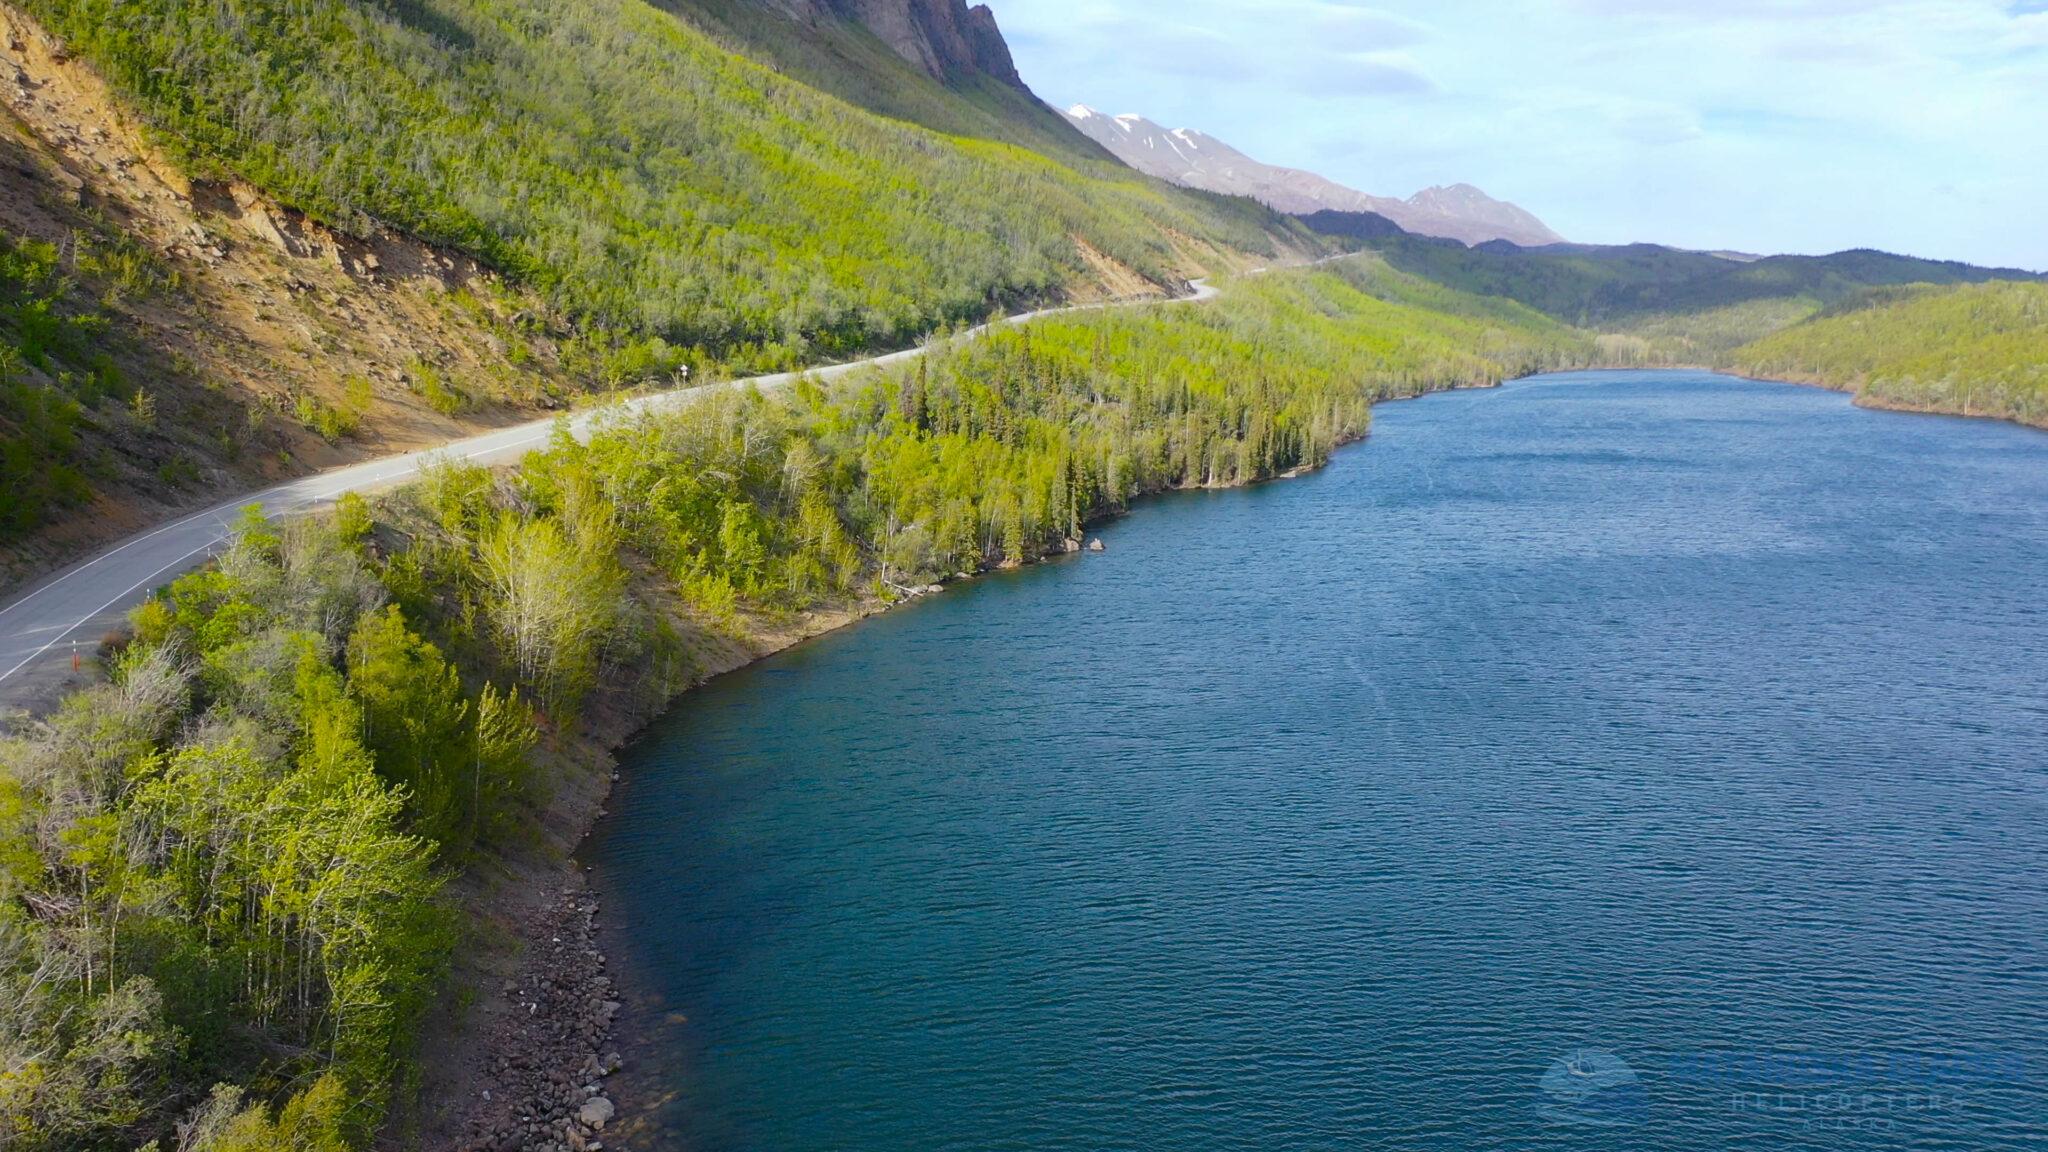 Glacier View Open Road